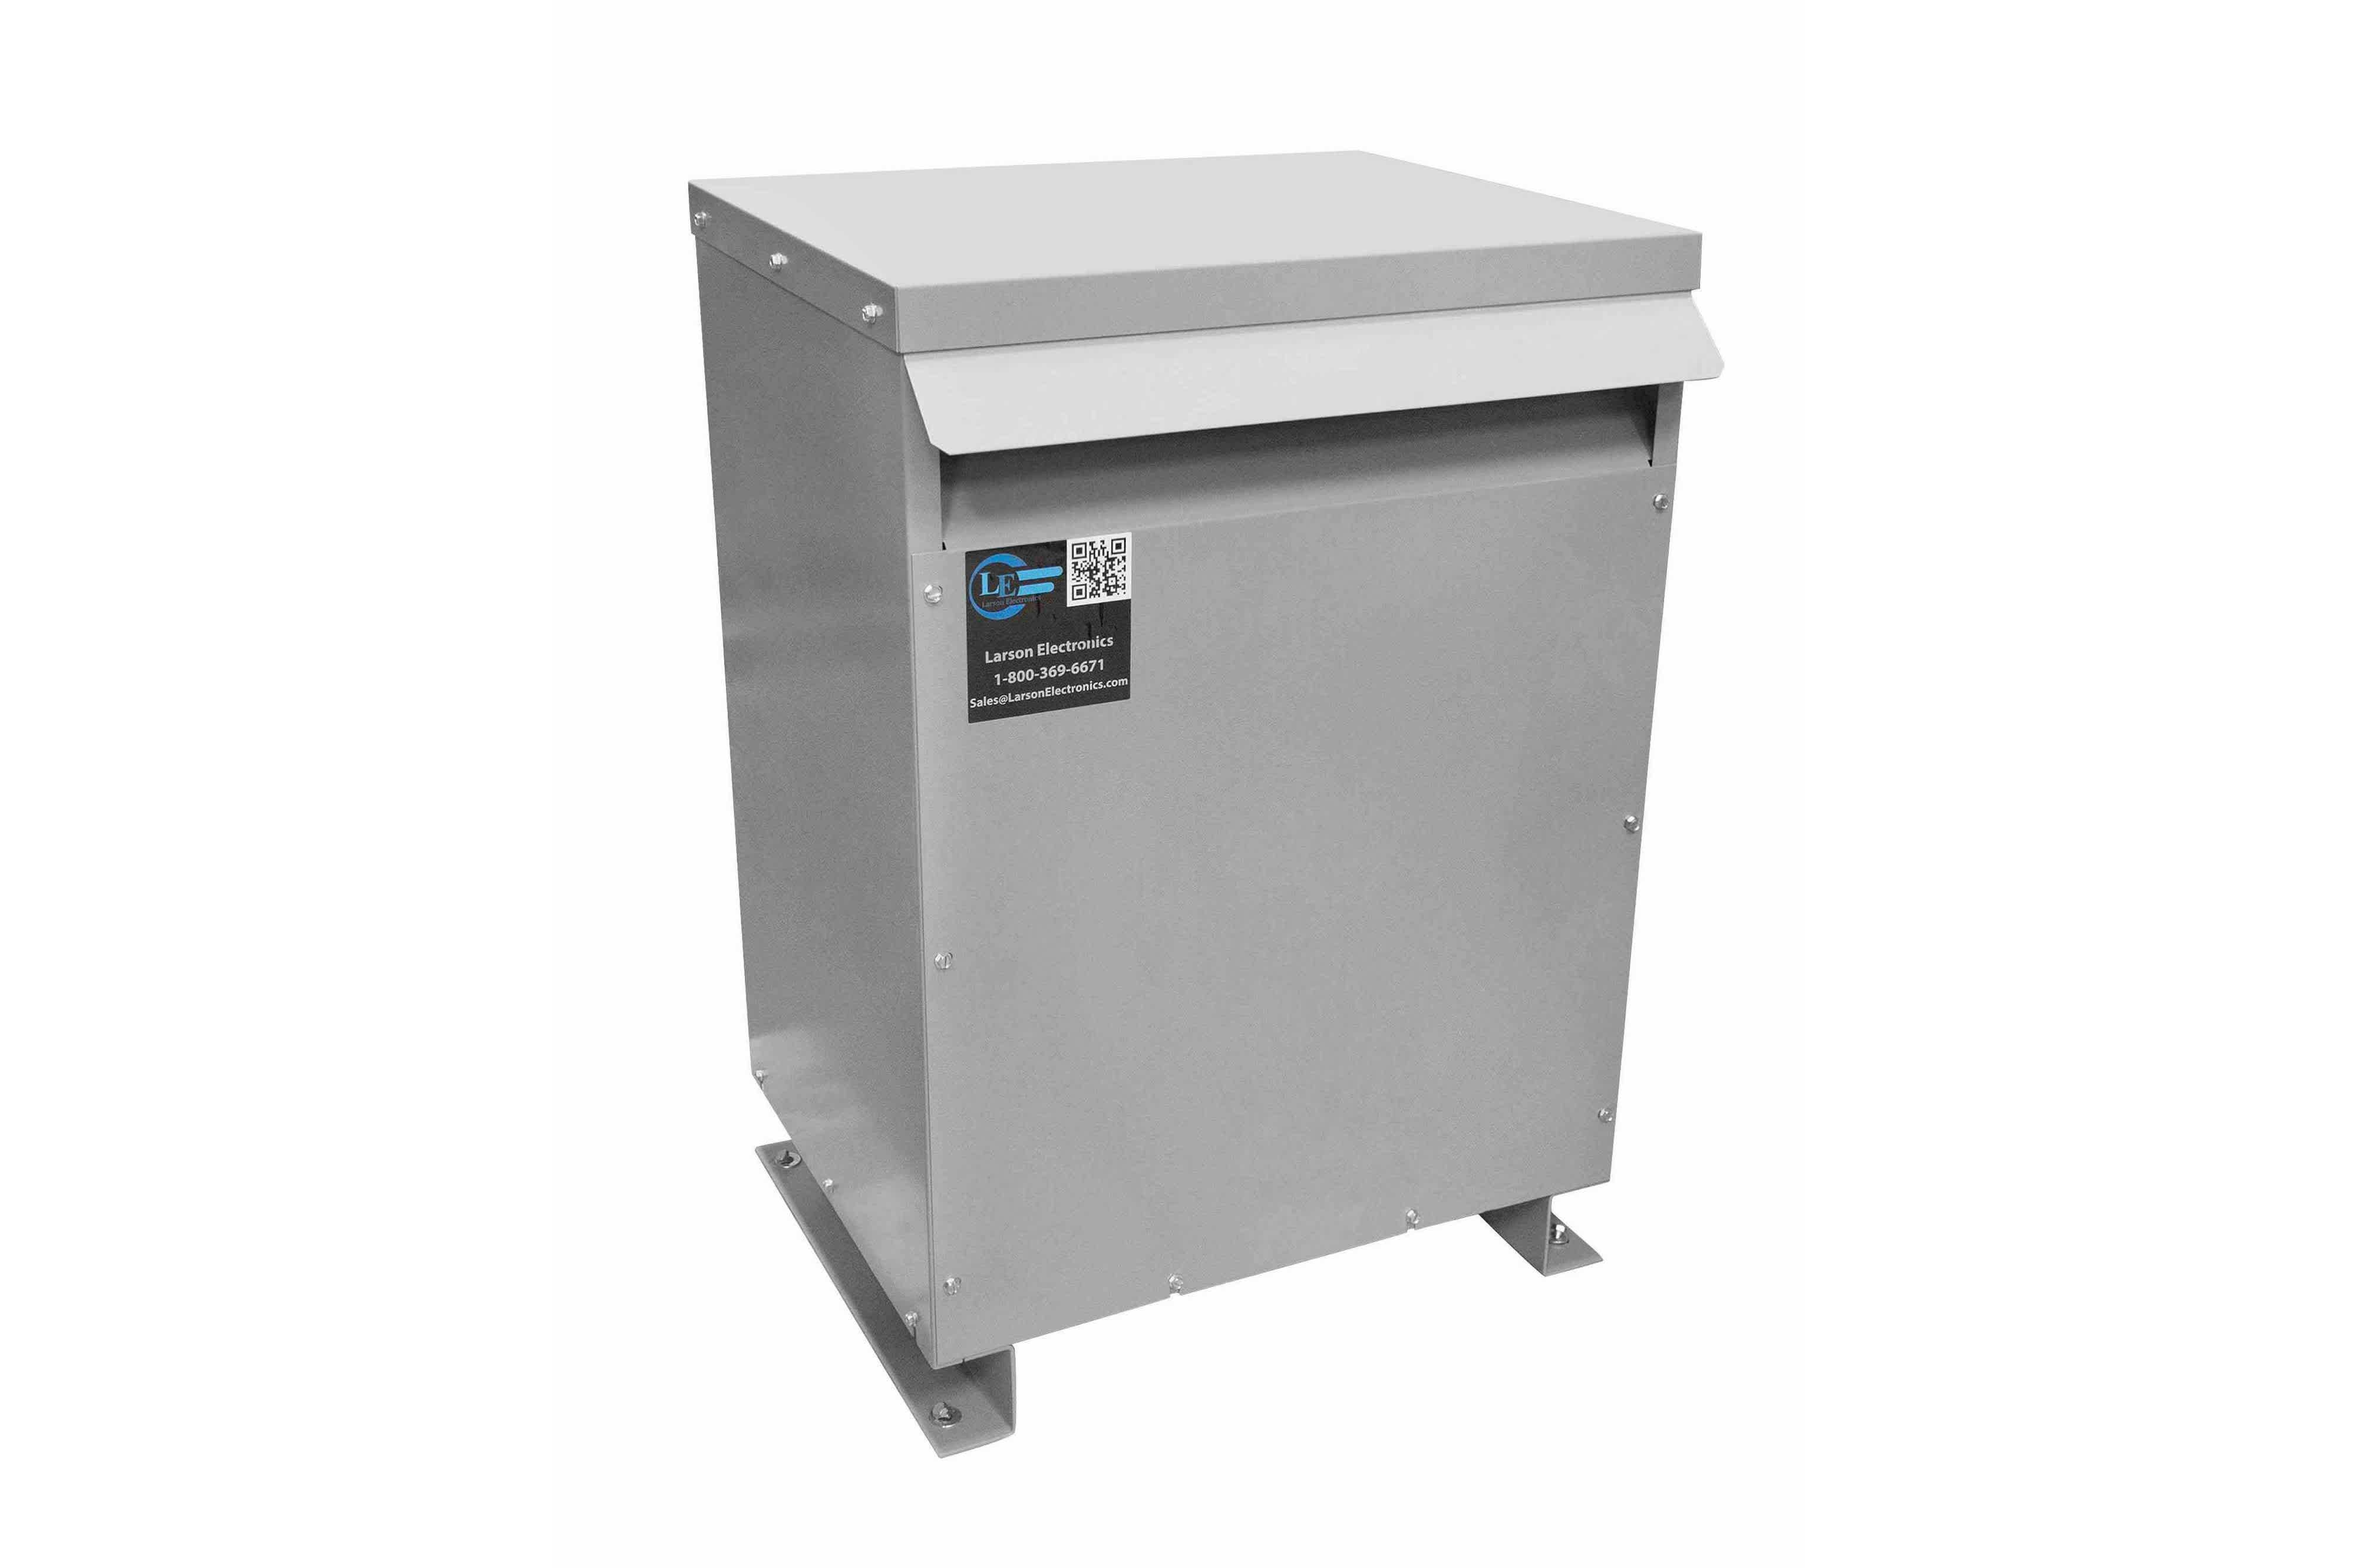 36 kVA 3PH Isolation Transformer, 460V Wye Primary, 415V Delta Secondary, N3R, Ventilated, 60 Hz